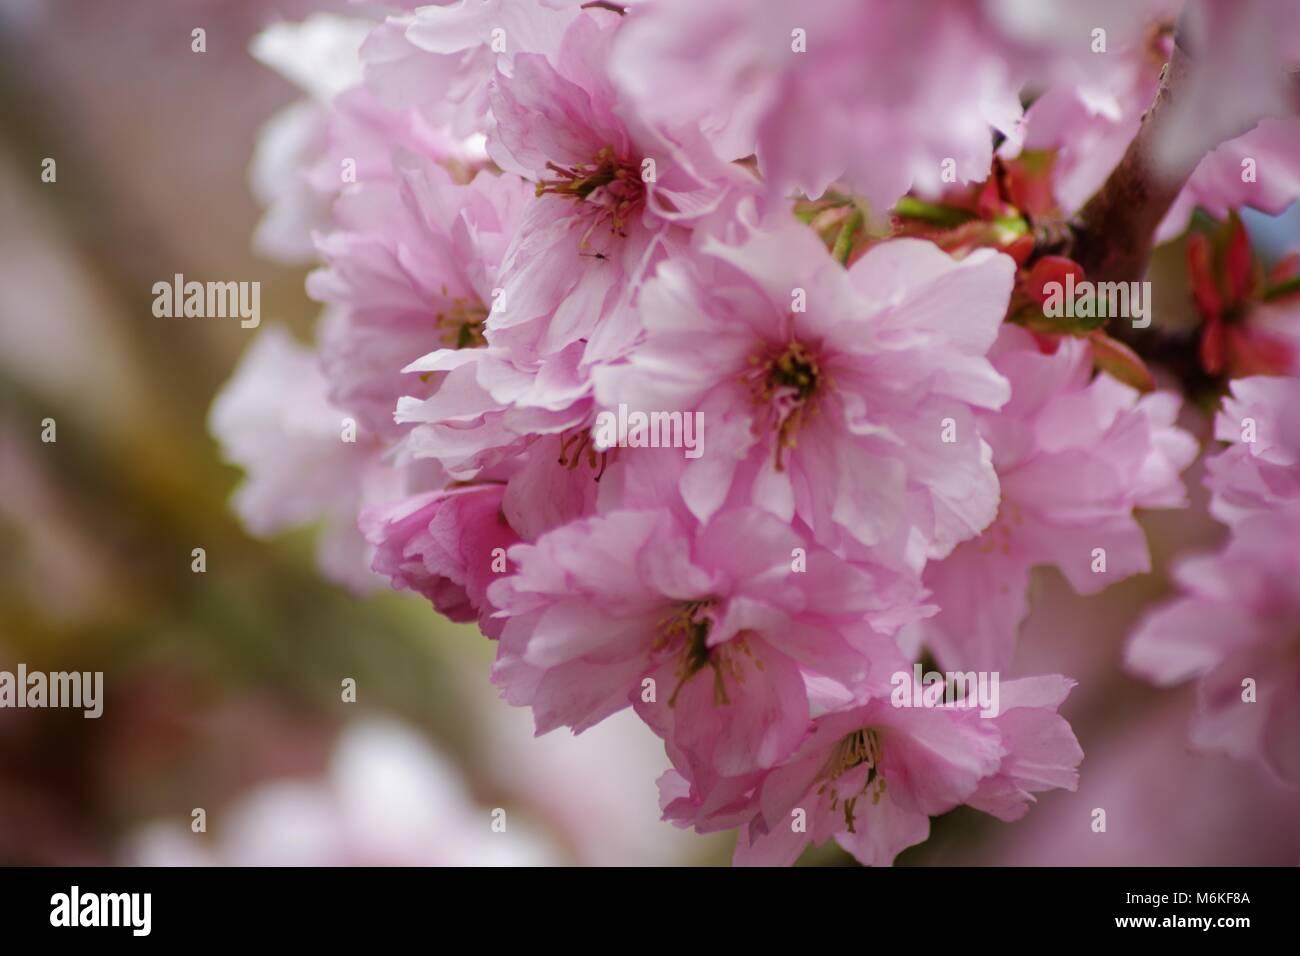 Pink Flowering Cherry Tree Blossom In An Aberdeen Garden Scotland